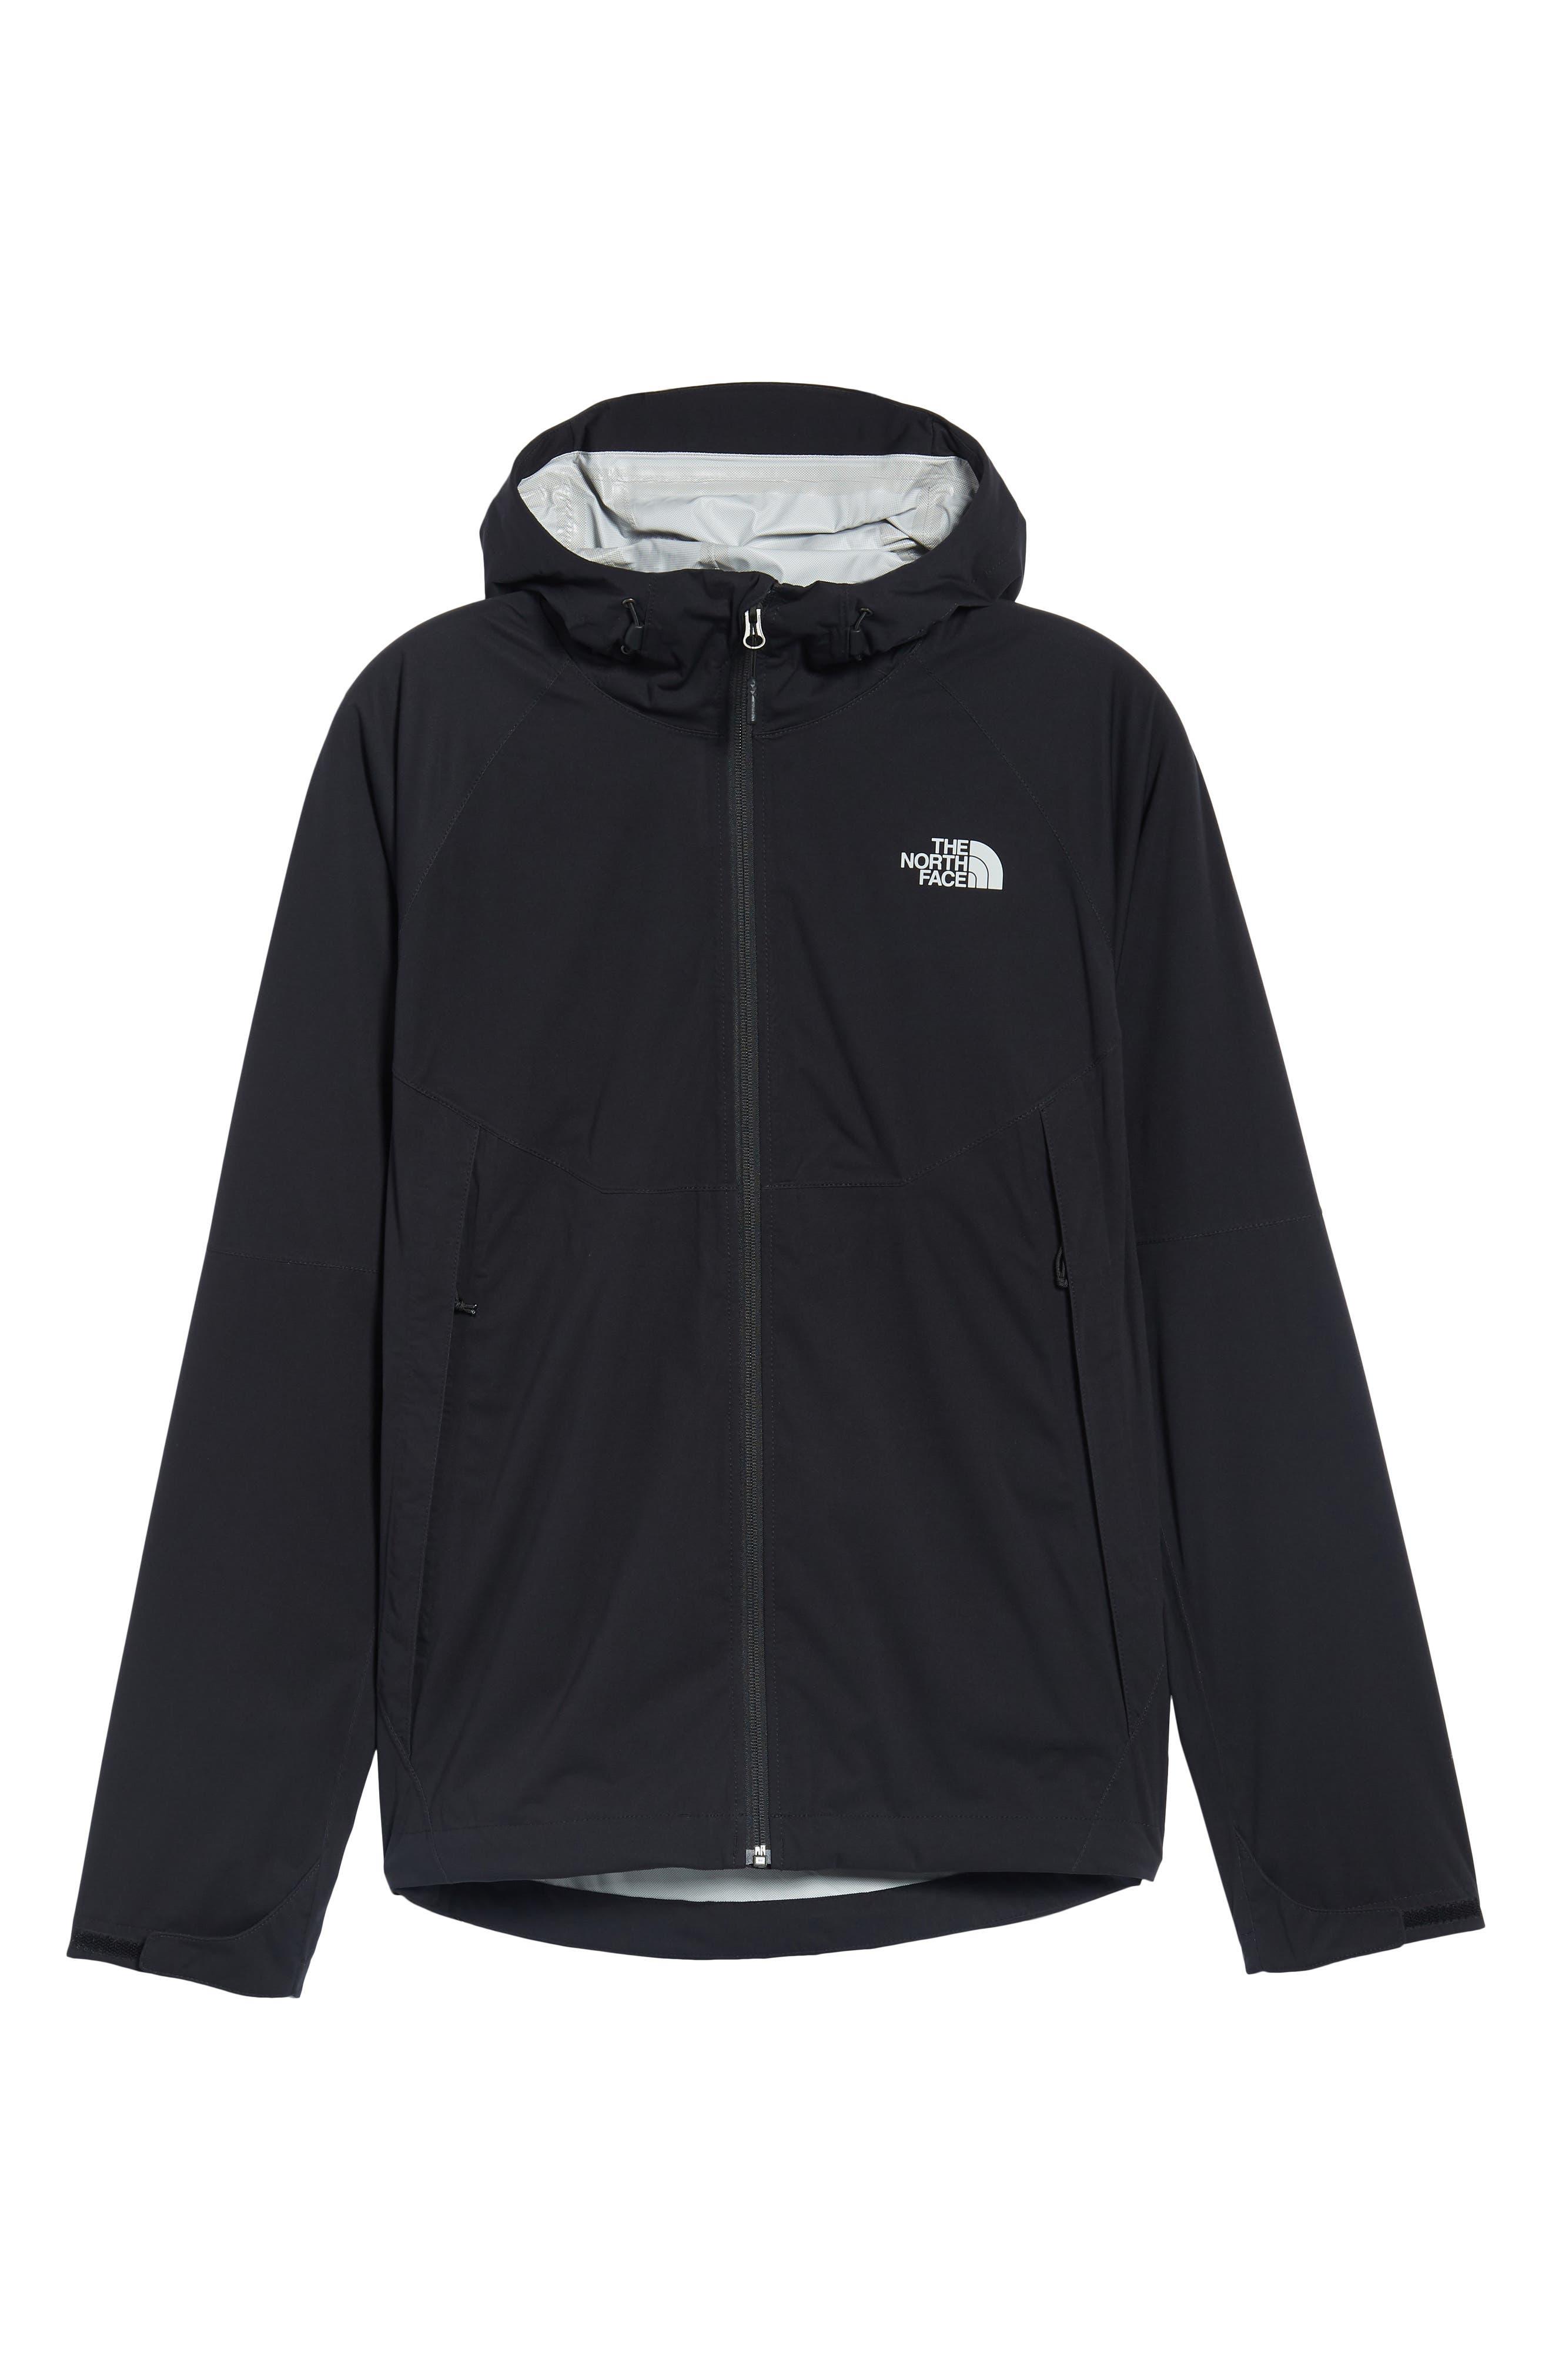 Allproof Stretch Hooded Rain Jacket,                             Alternate thumbnail 6, color,                             TNF BLACK